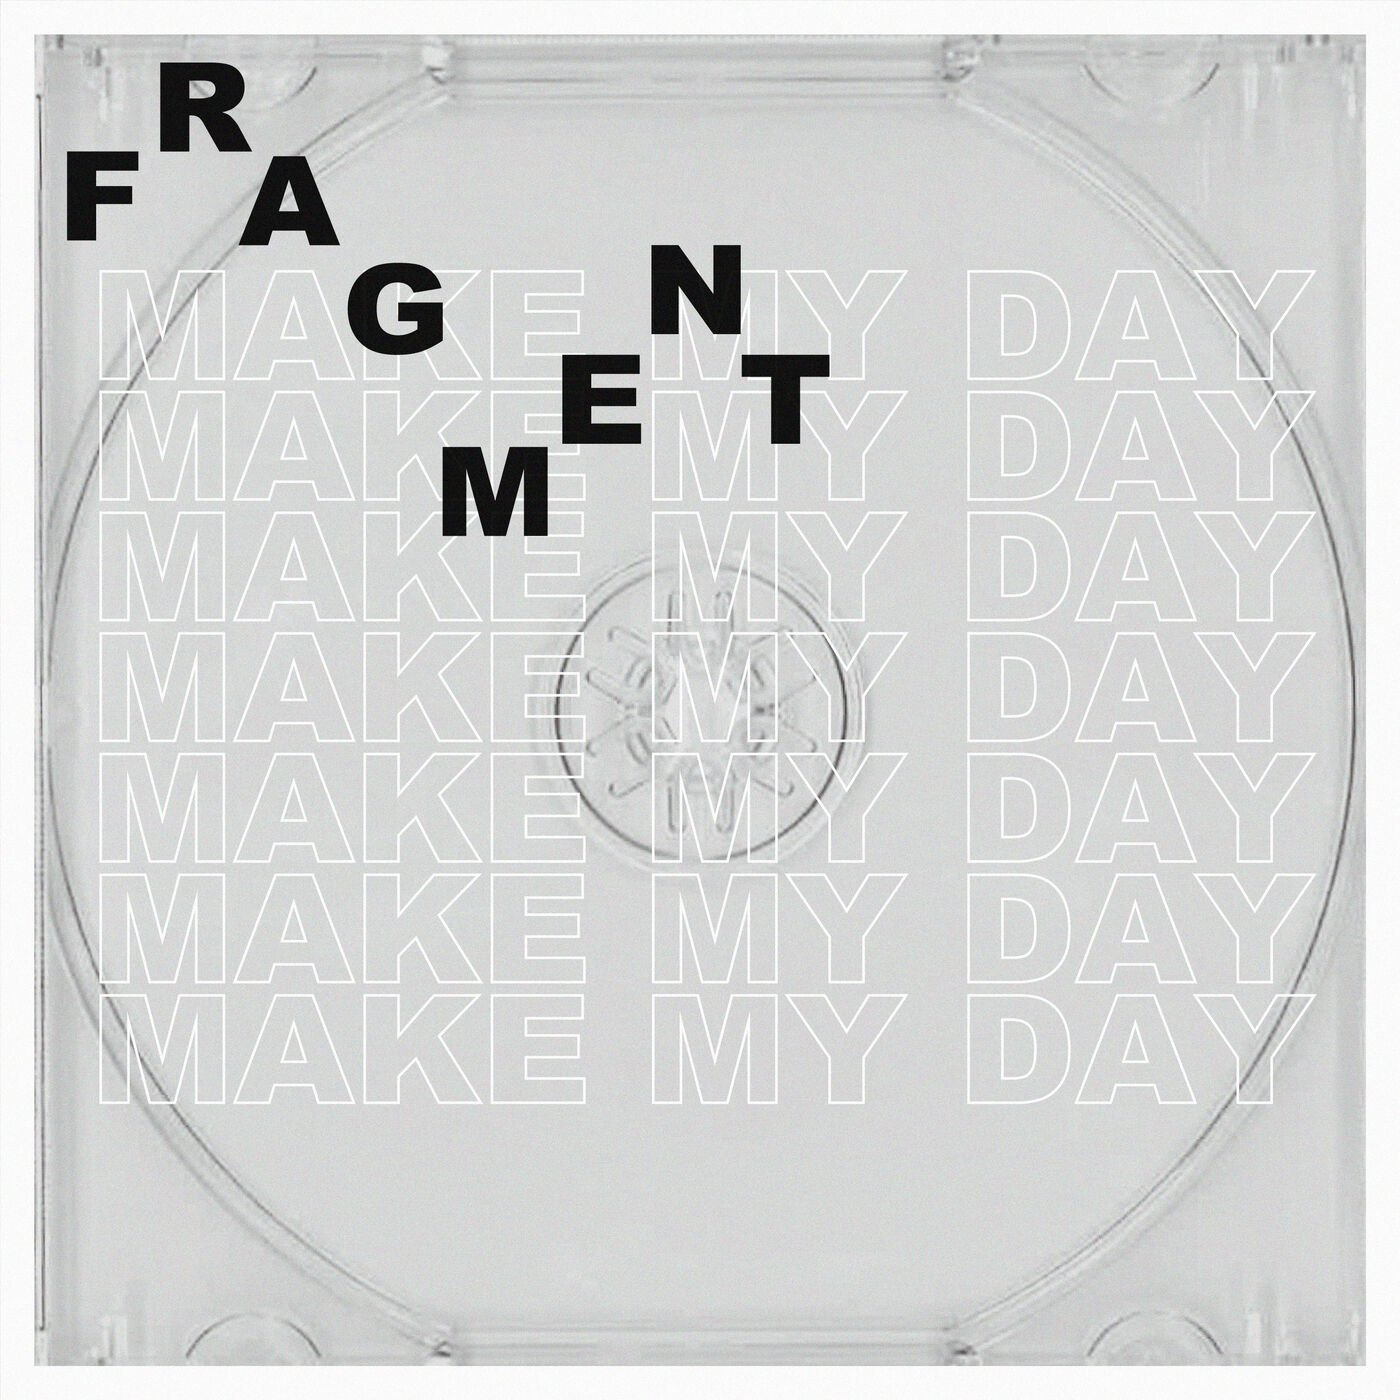 Make My Day - Fragment [single] (2019)